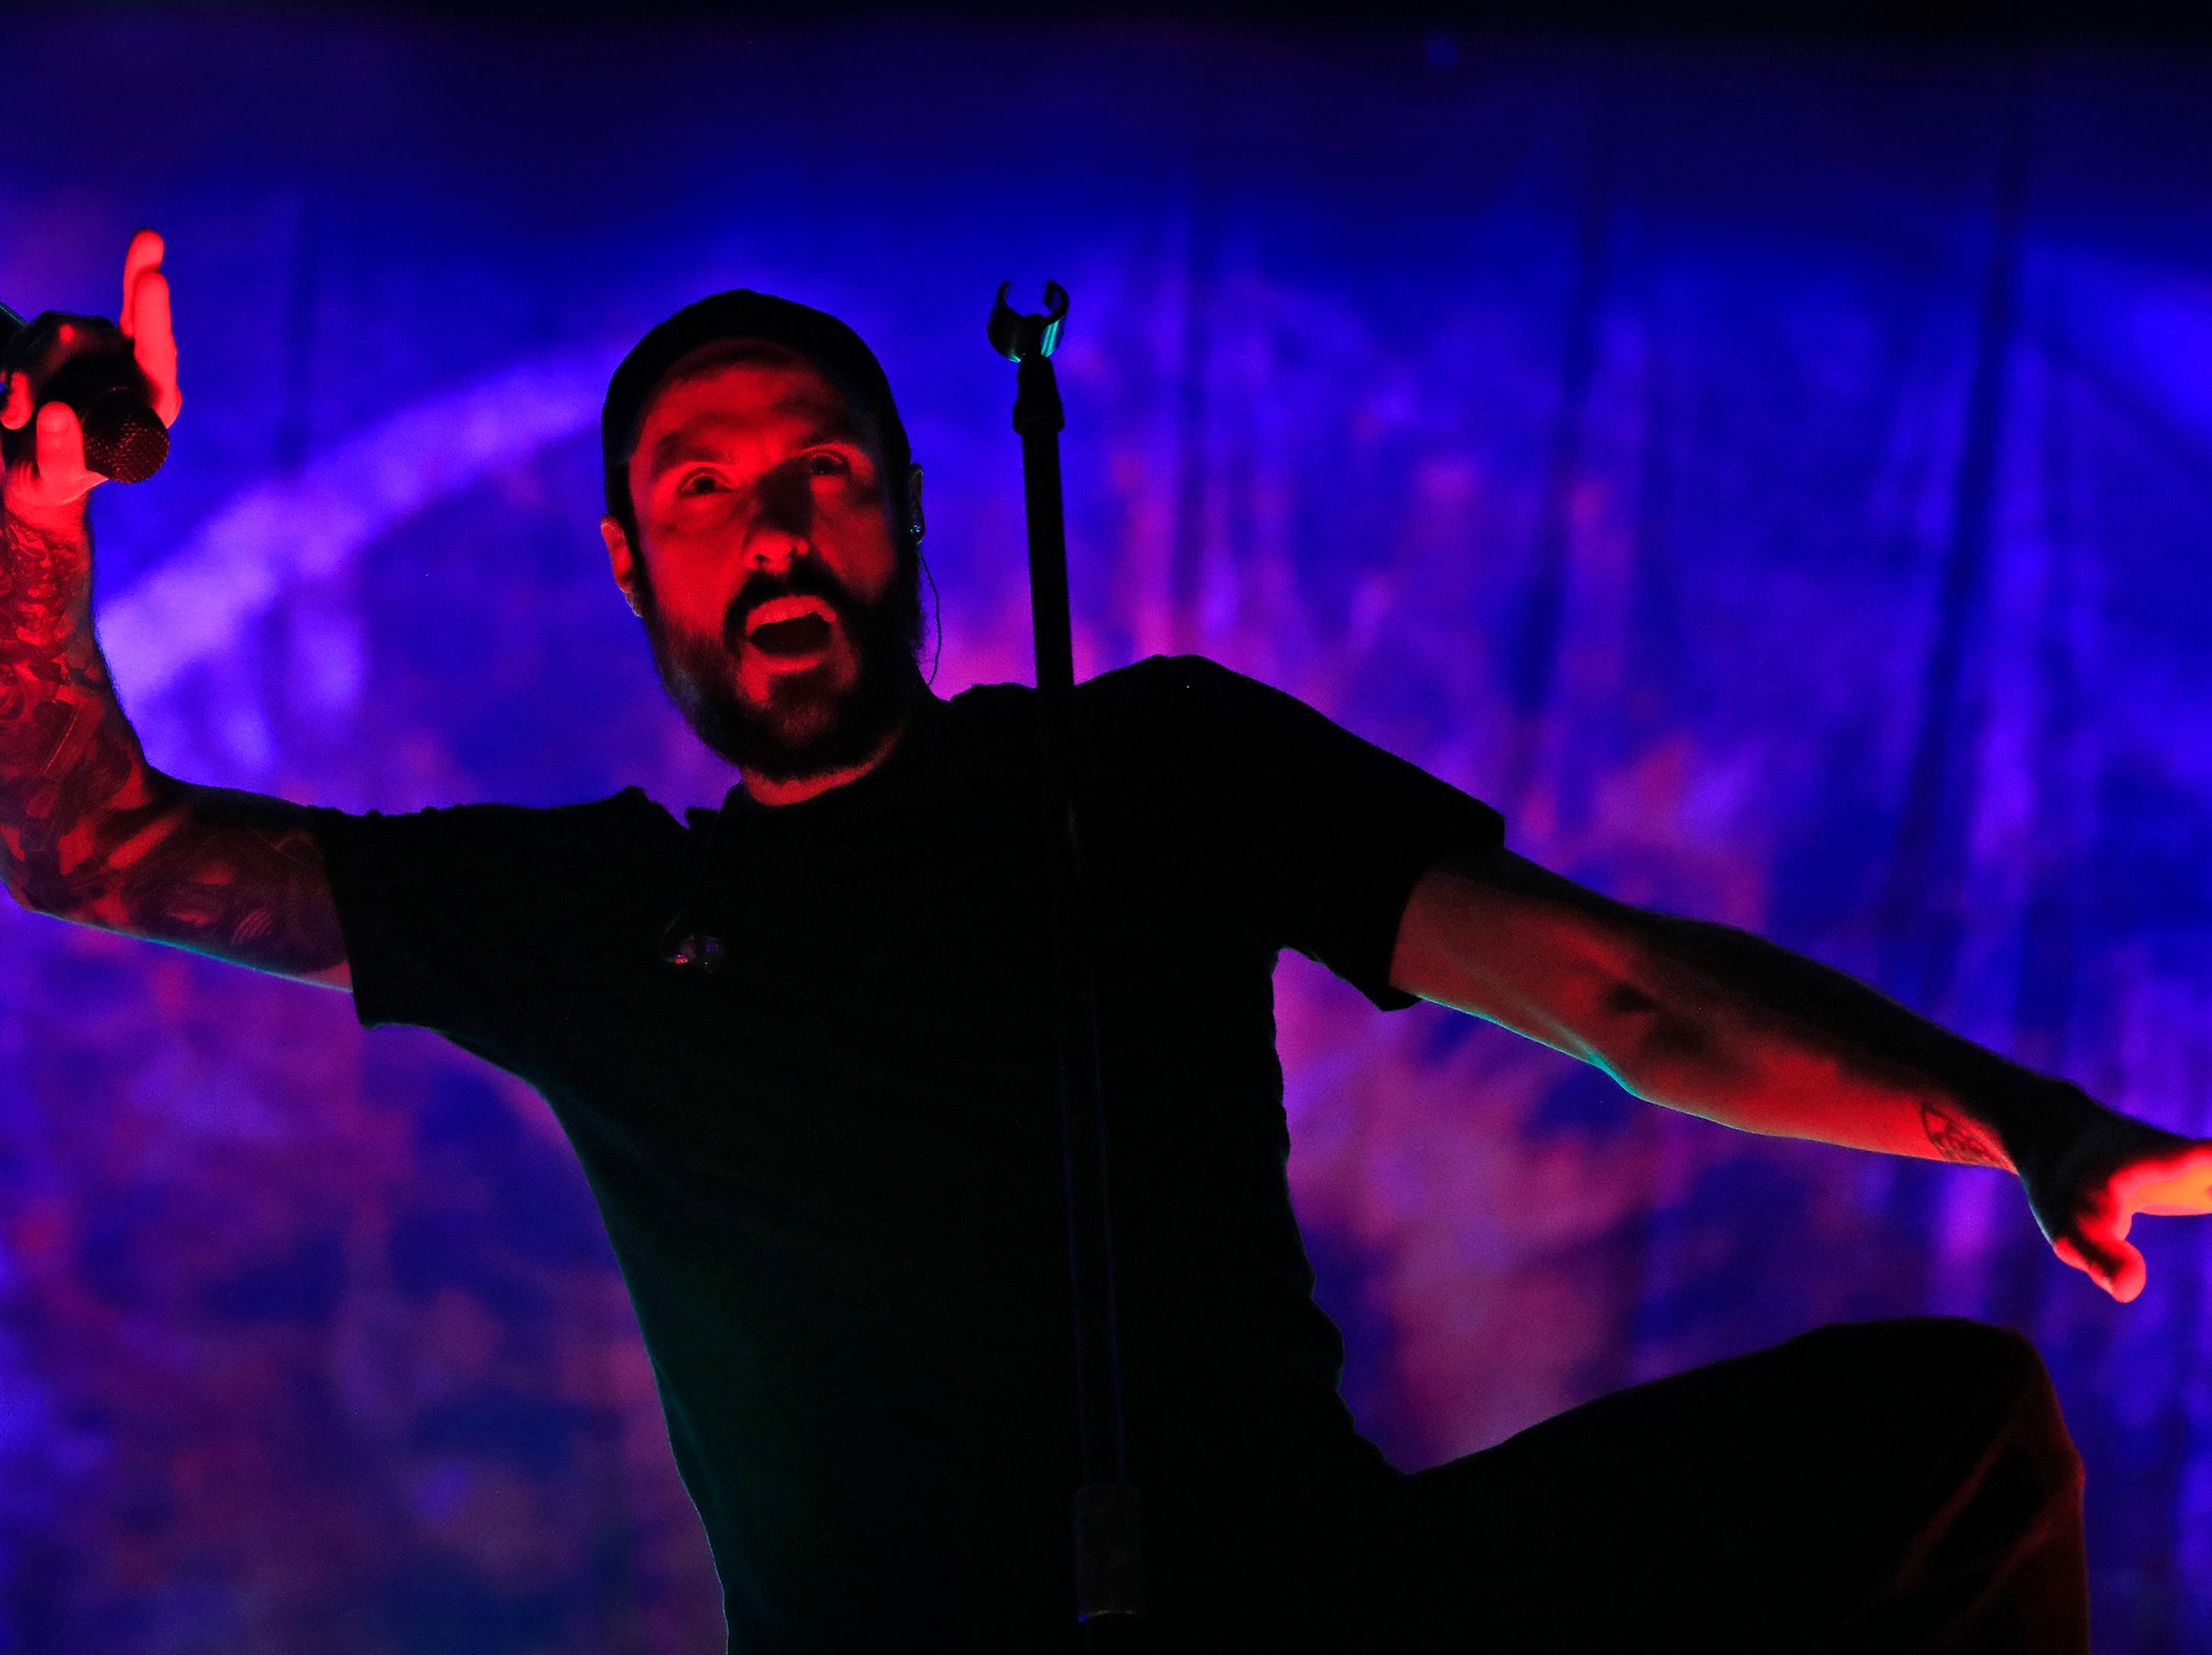 Breaking Benjamin perform at the Resch Center on Saturday, November 24, 2018 in Ashwaubenon, Wis.